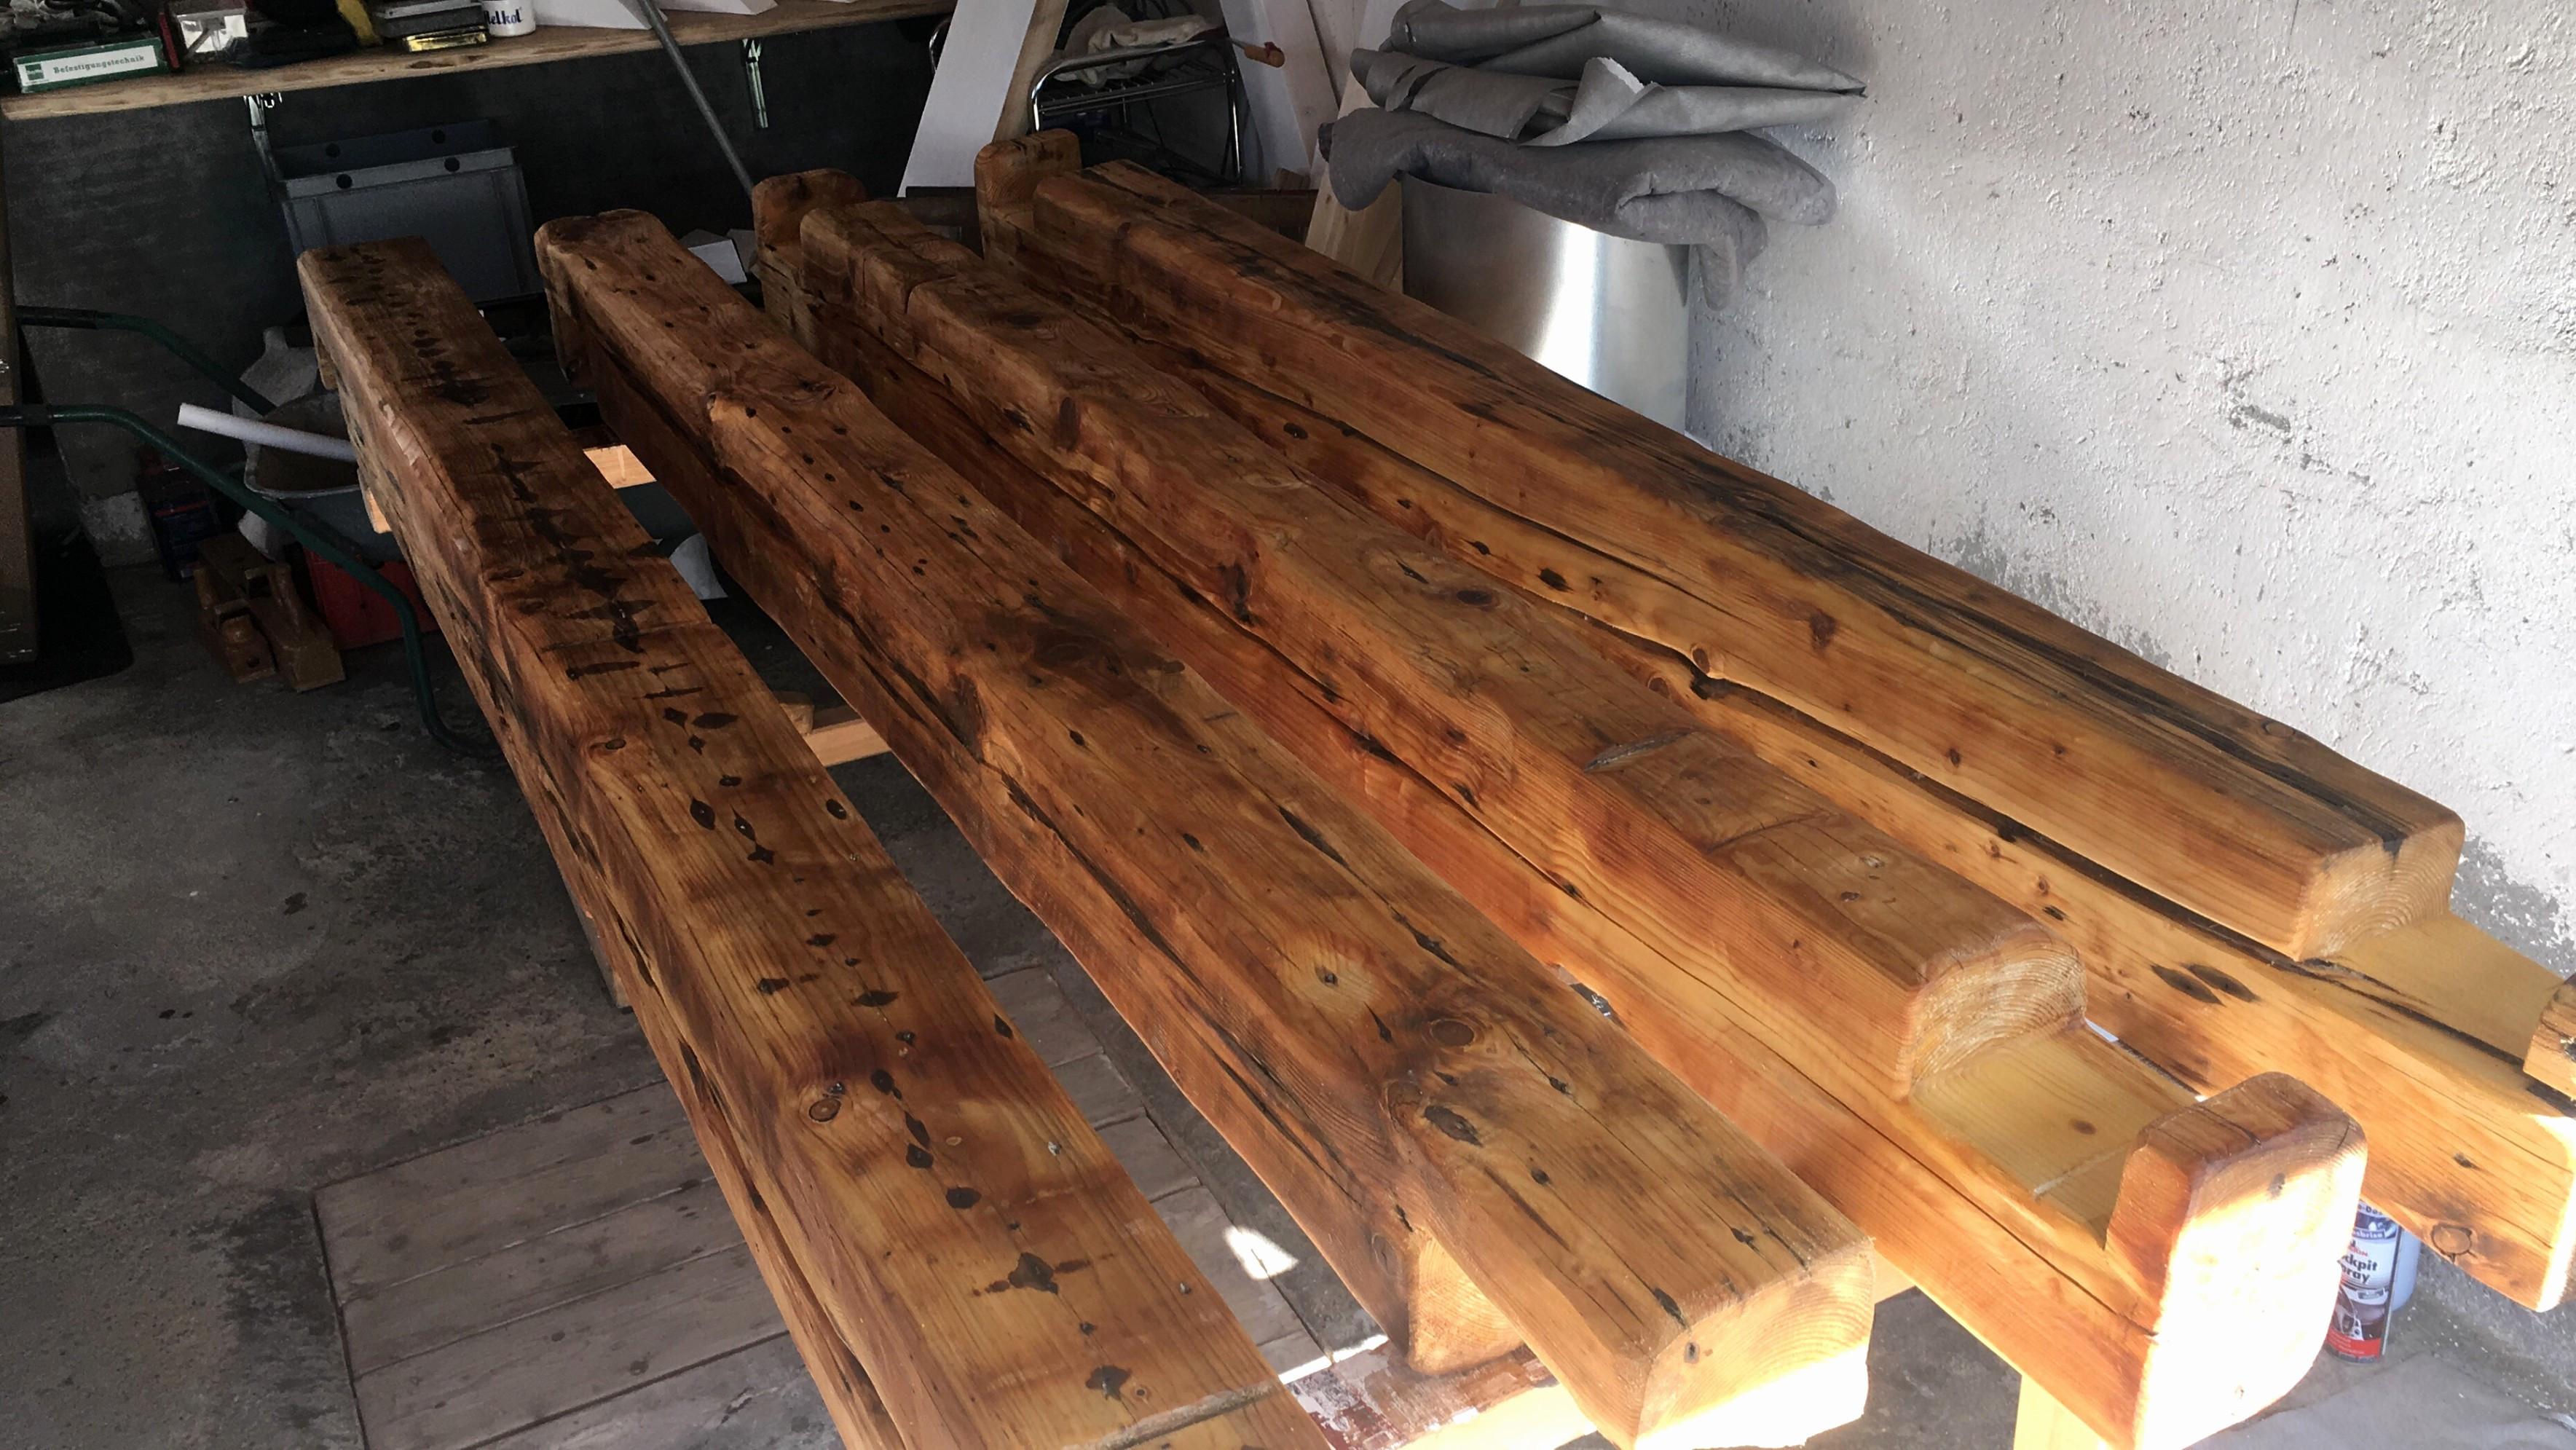 refinish hardwood floors gray of 13 fresh hardwood floors gallery dizpos com within hardwood floors awesome 50 fresh how to put in hardwood floors 50 s collection of 13